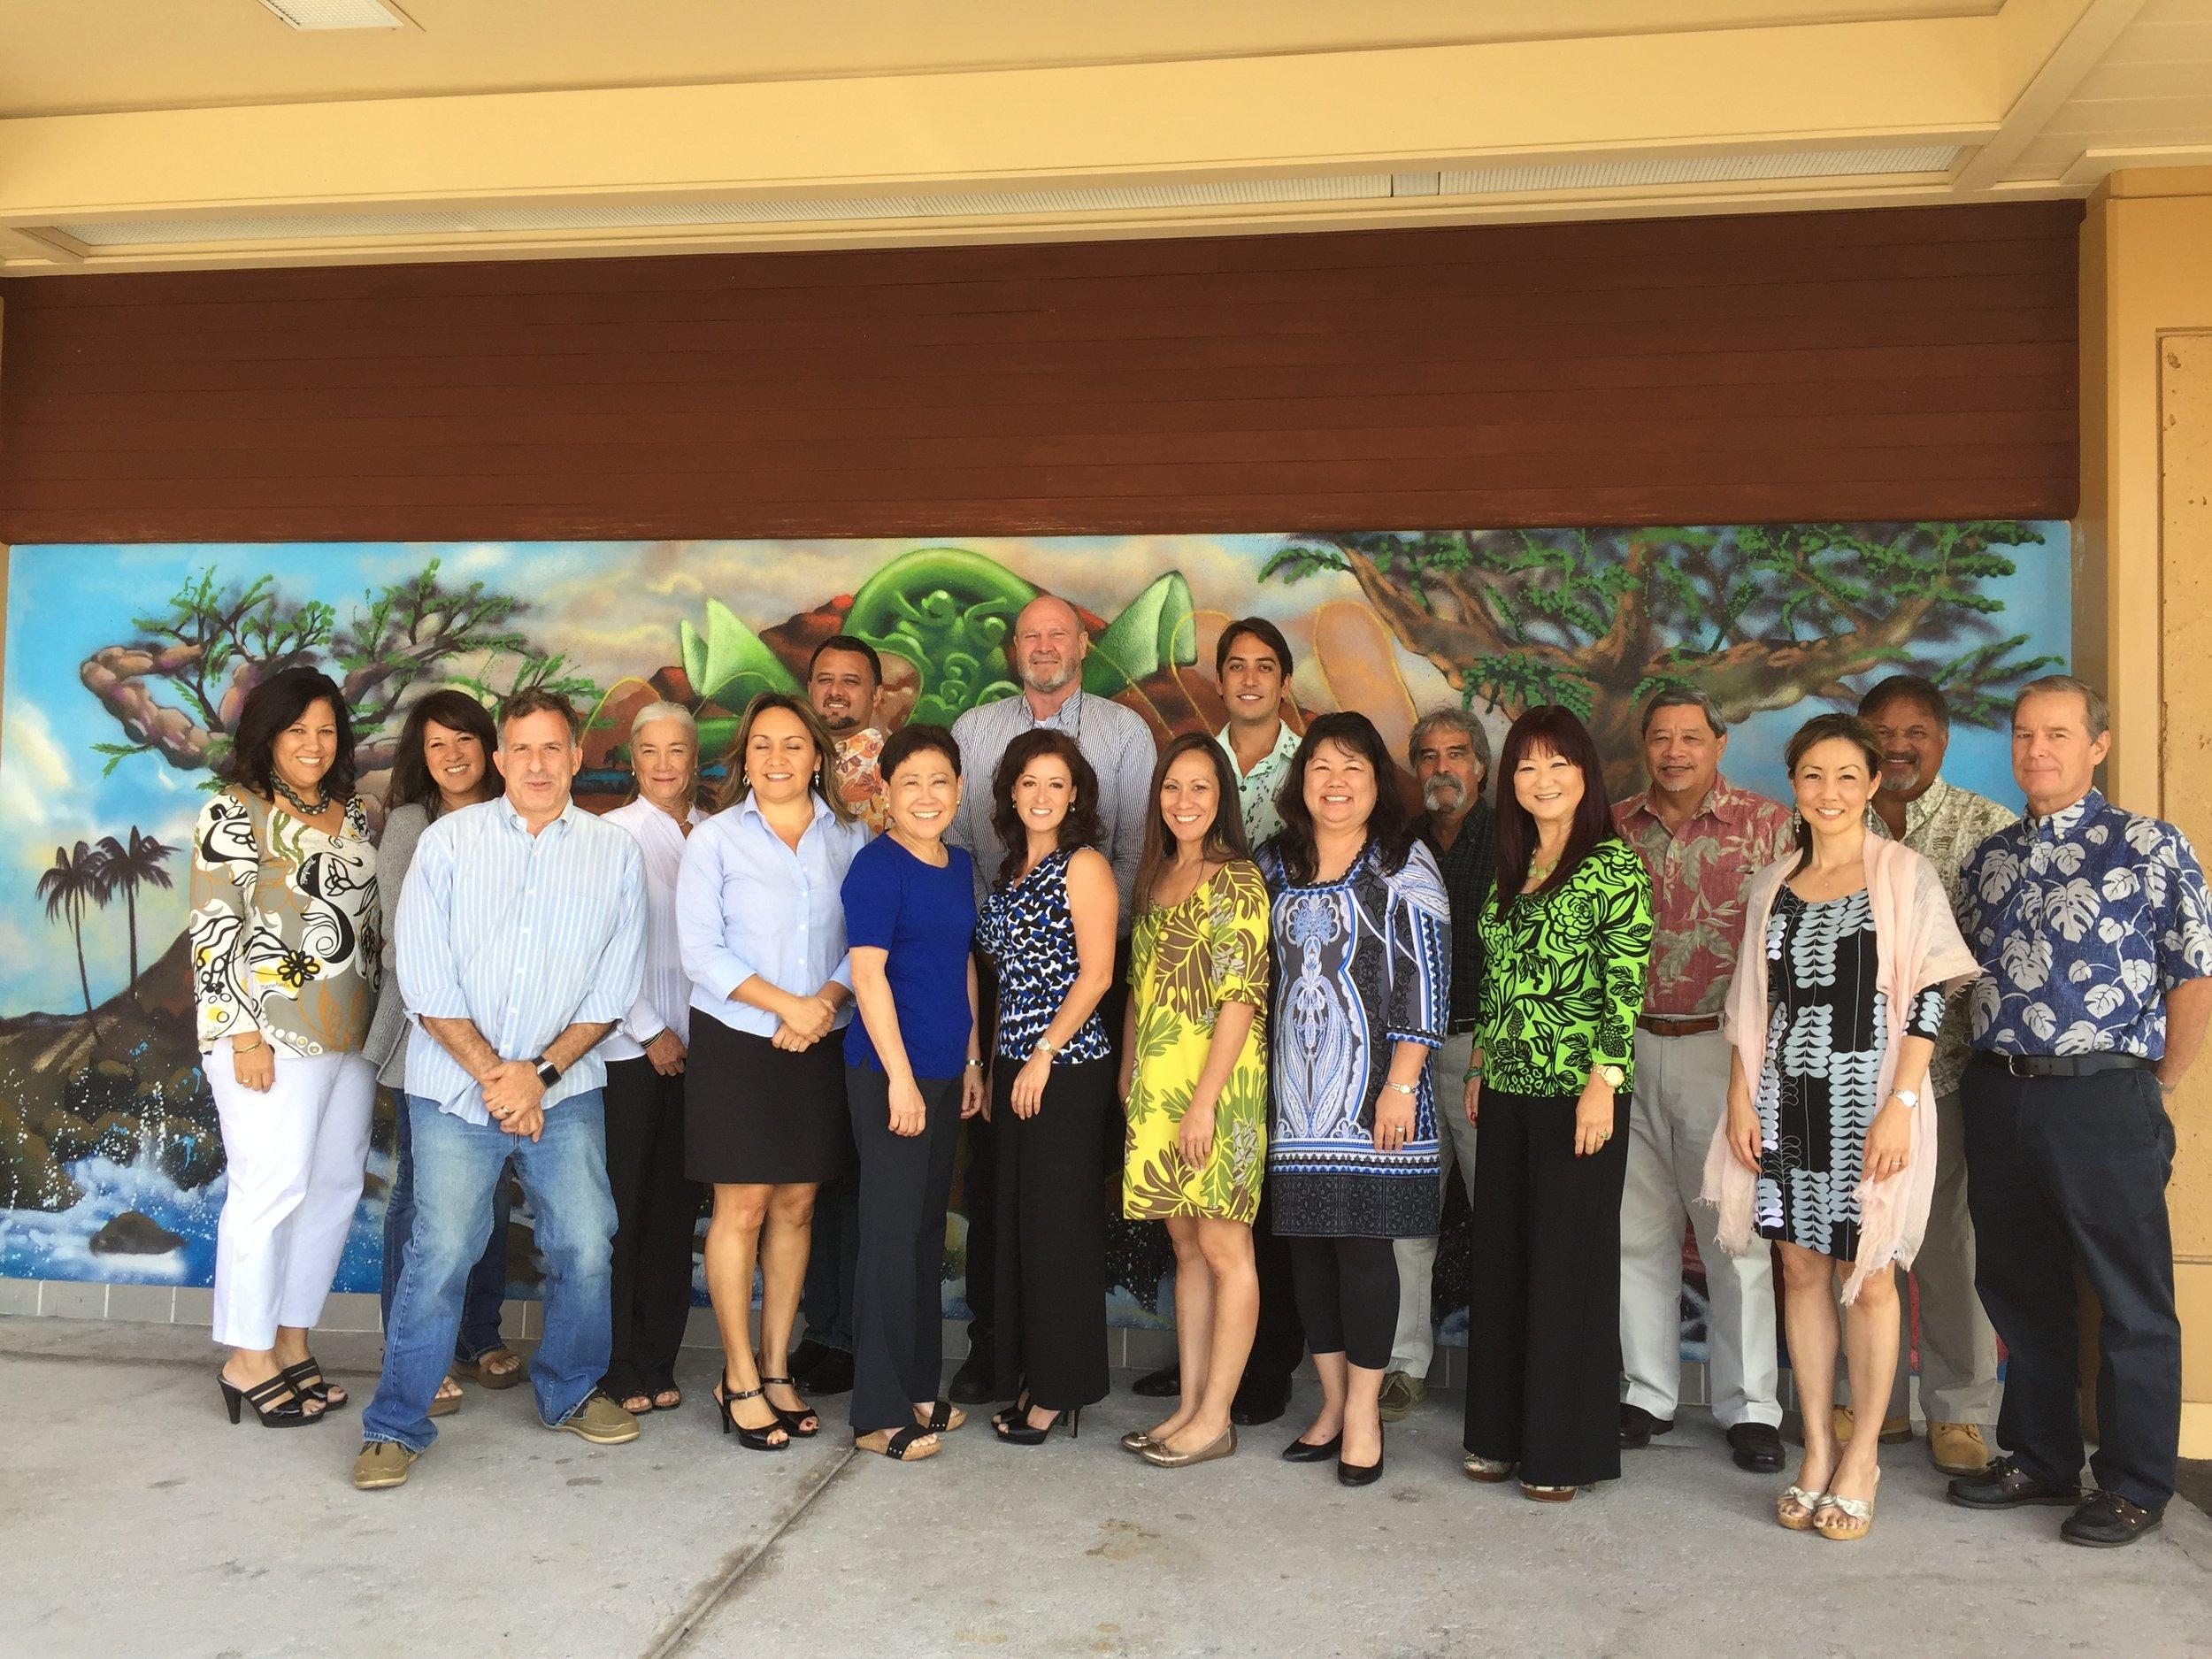 Navigation Council - West Hawai'i